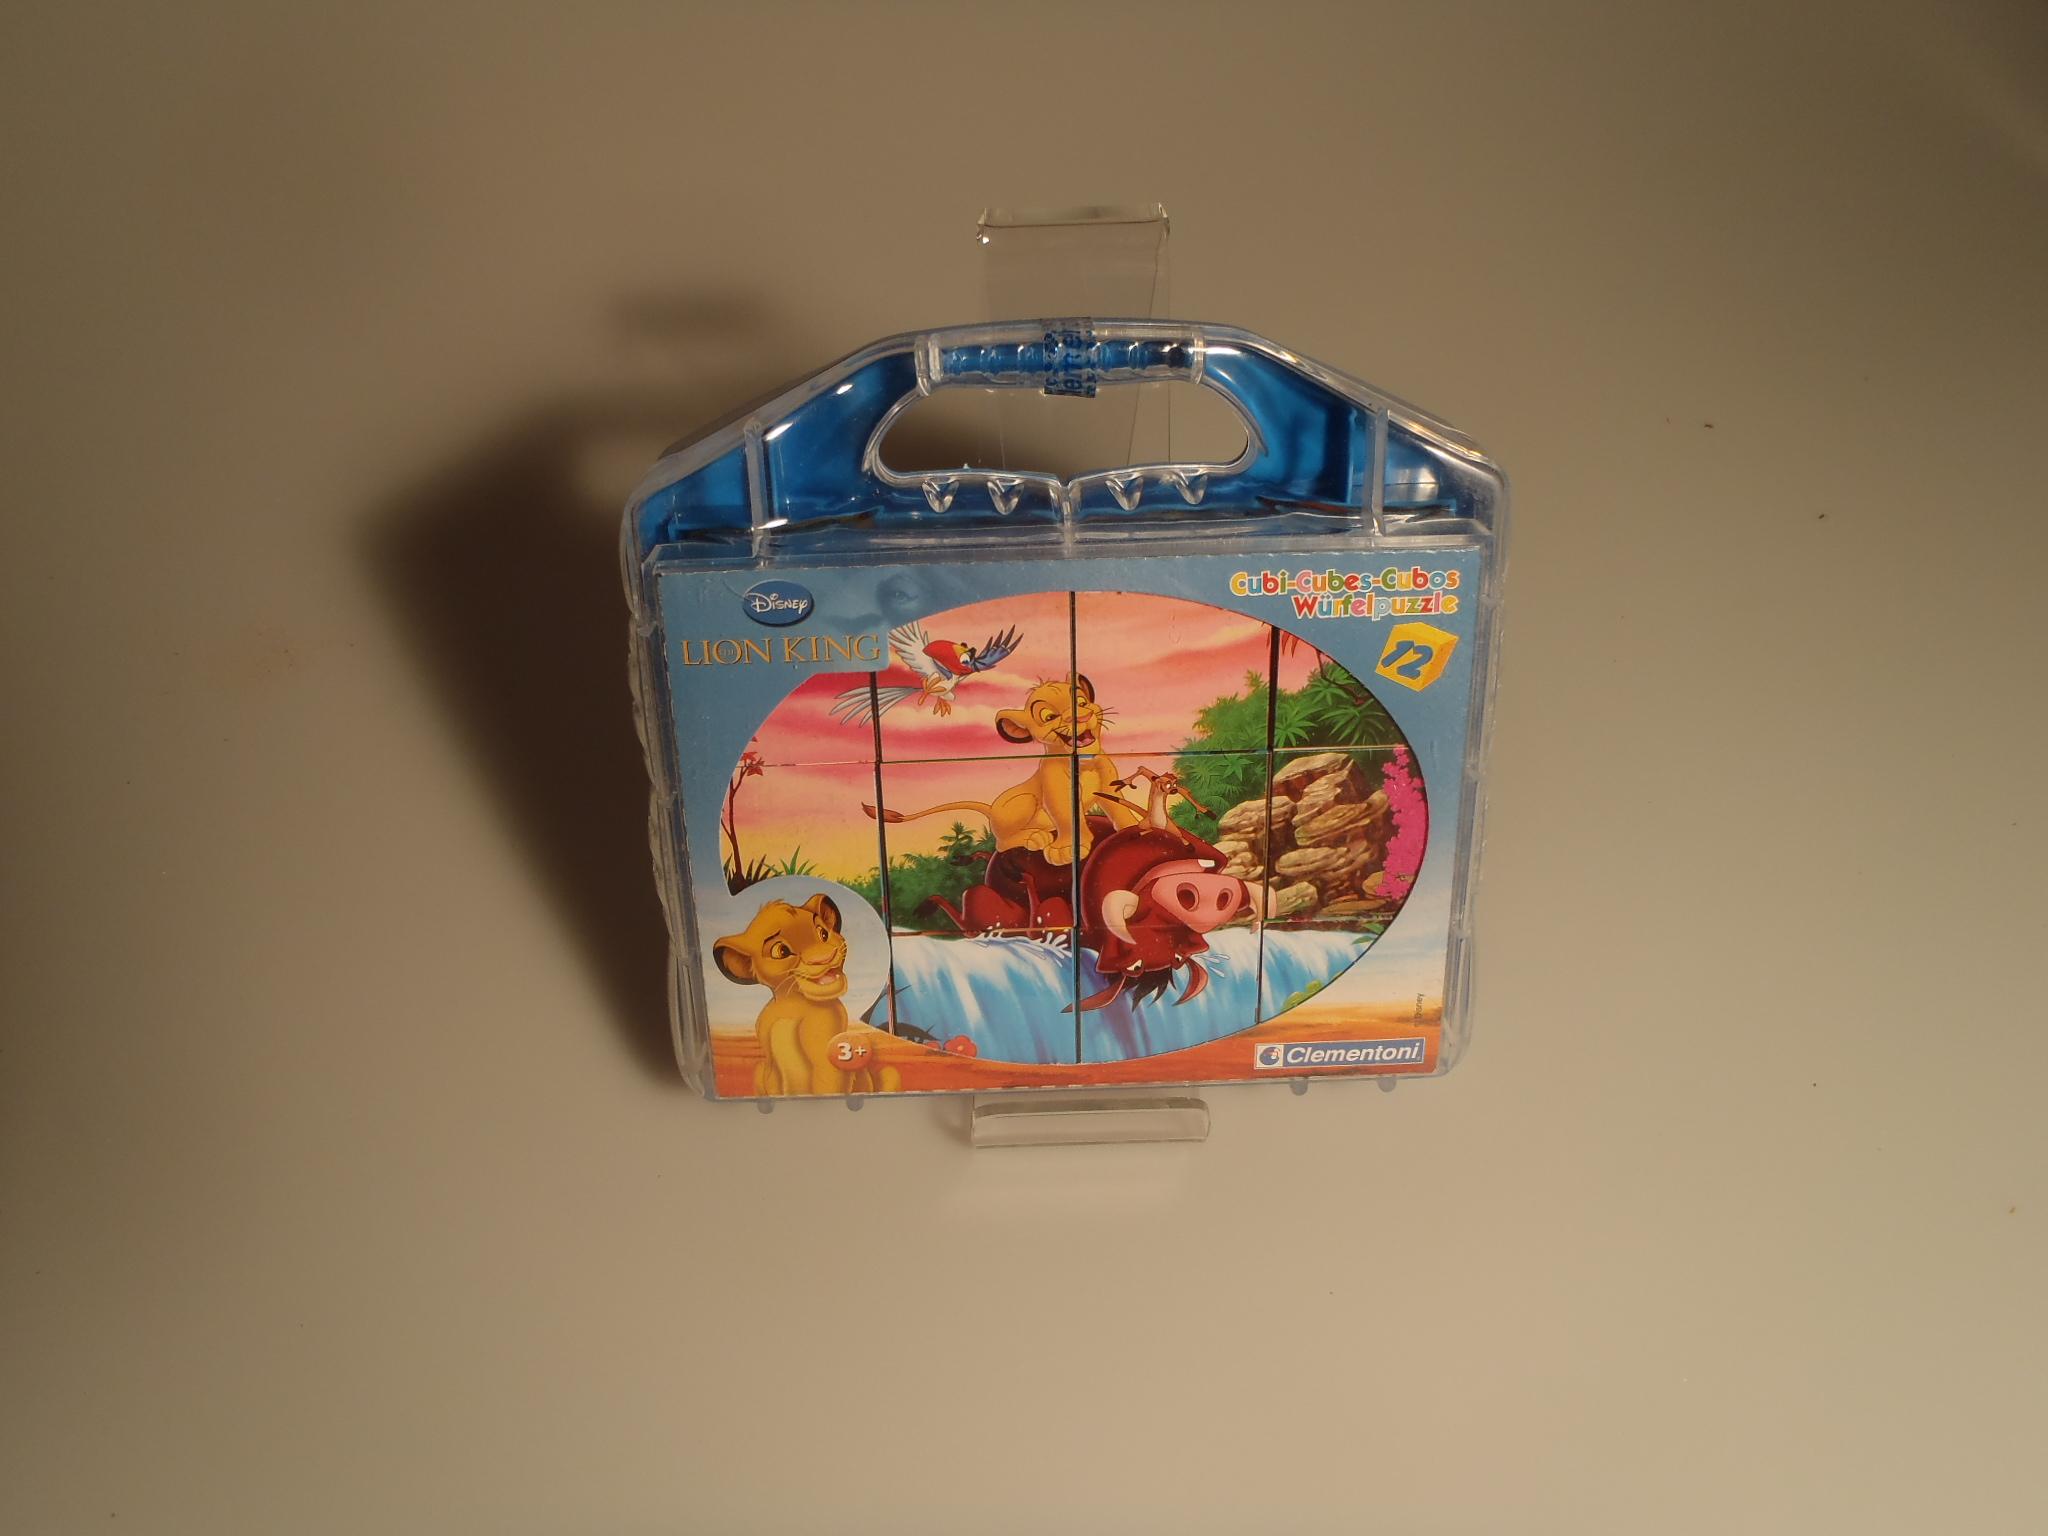 Leksaker - Pussel Disney Leijon Kungen 3D - Bokextra a0eb4d27dbef6